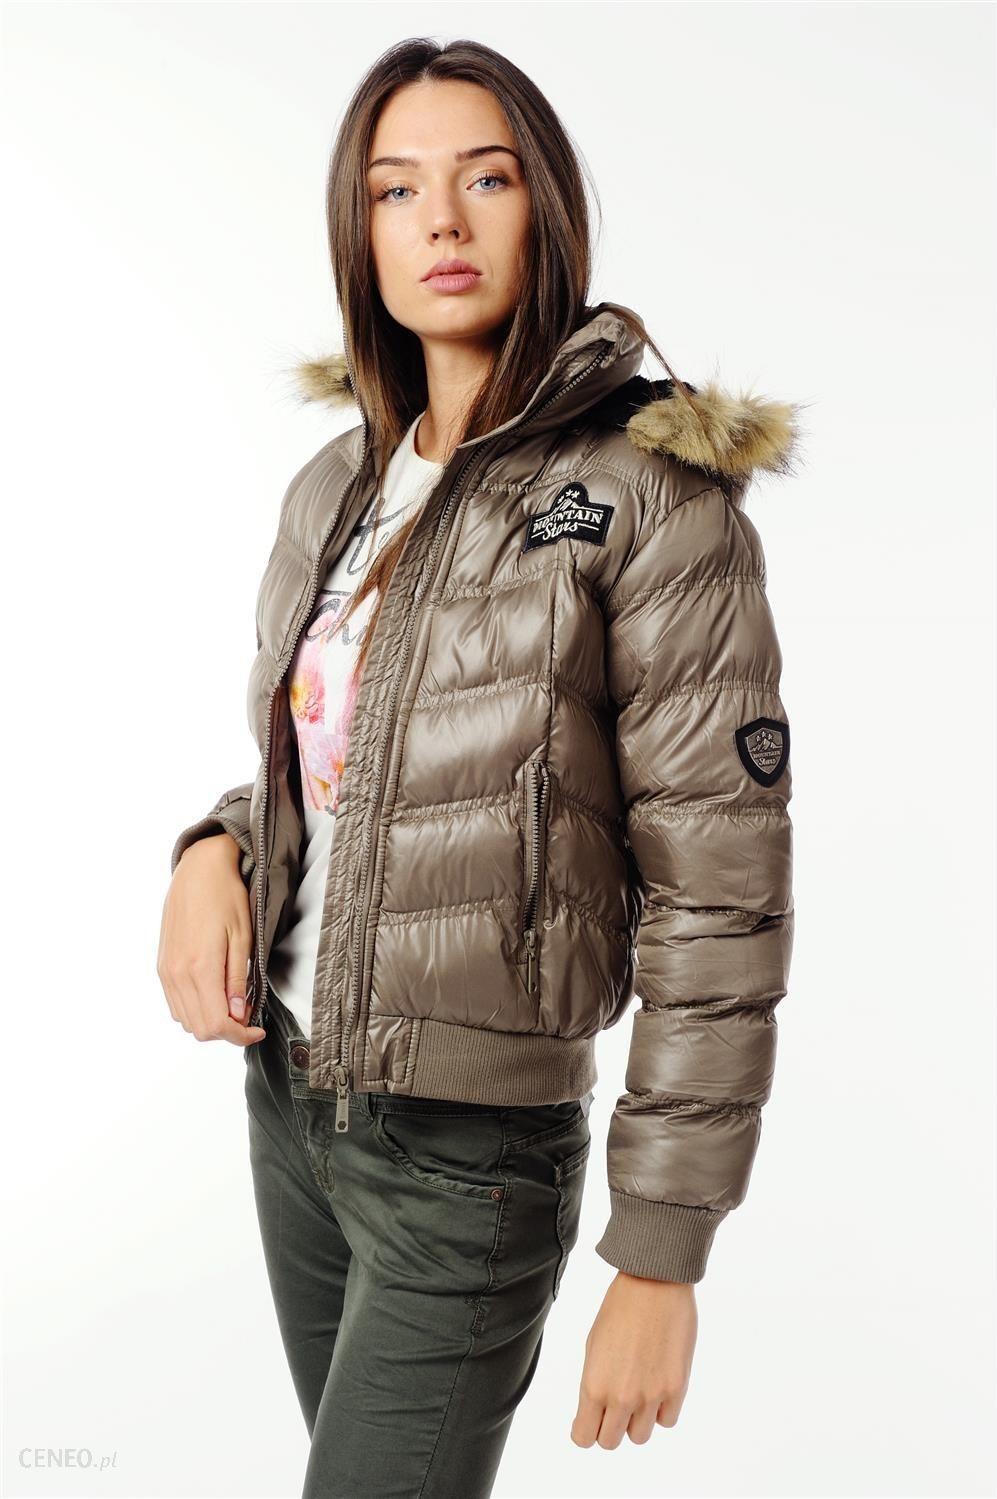 fa076fe53c3baa Krótka kurtka pikowana - Emoi by Emonite - ciemny beżowy - Ceny i ...